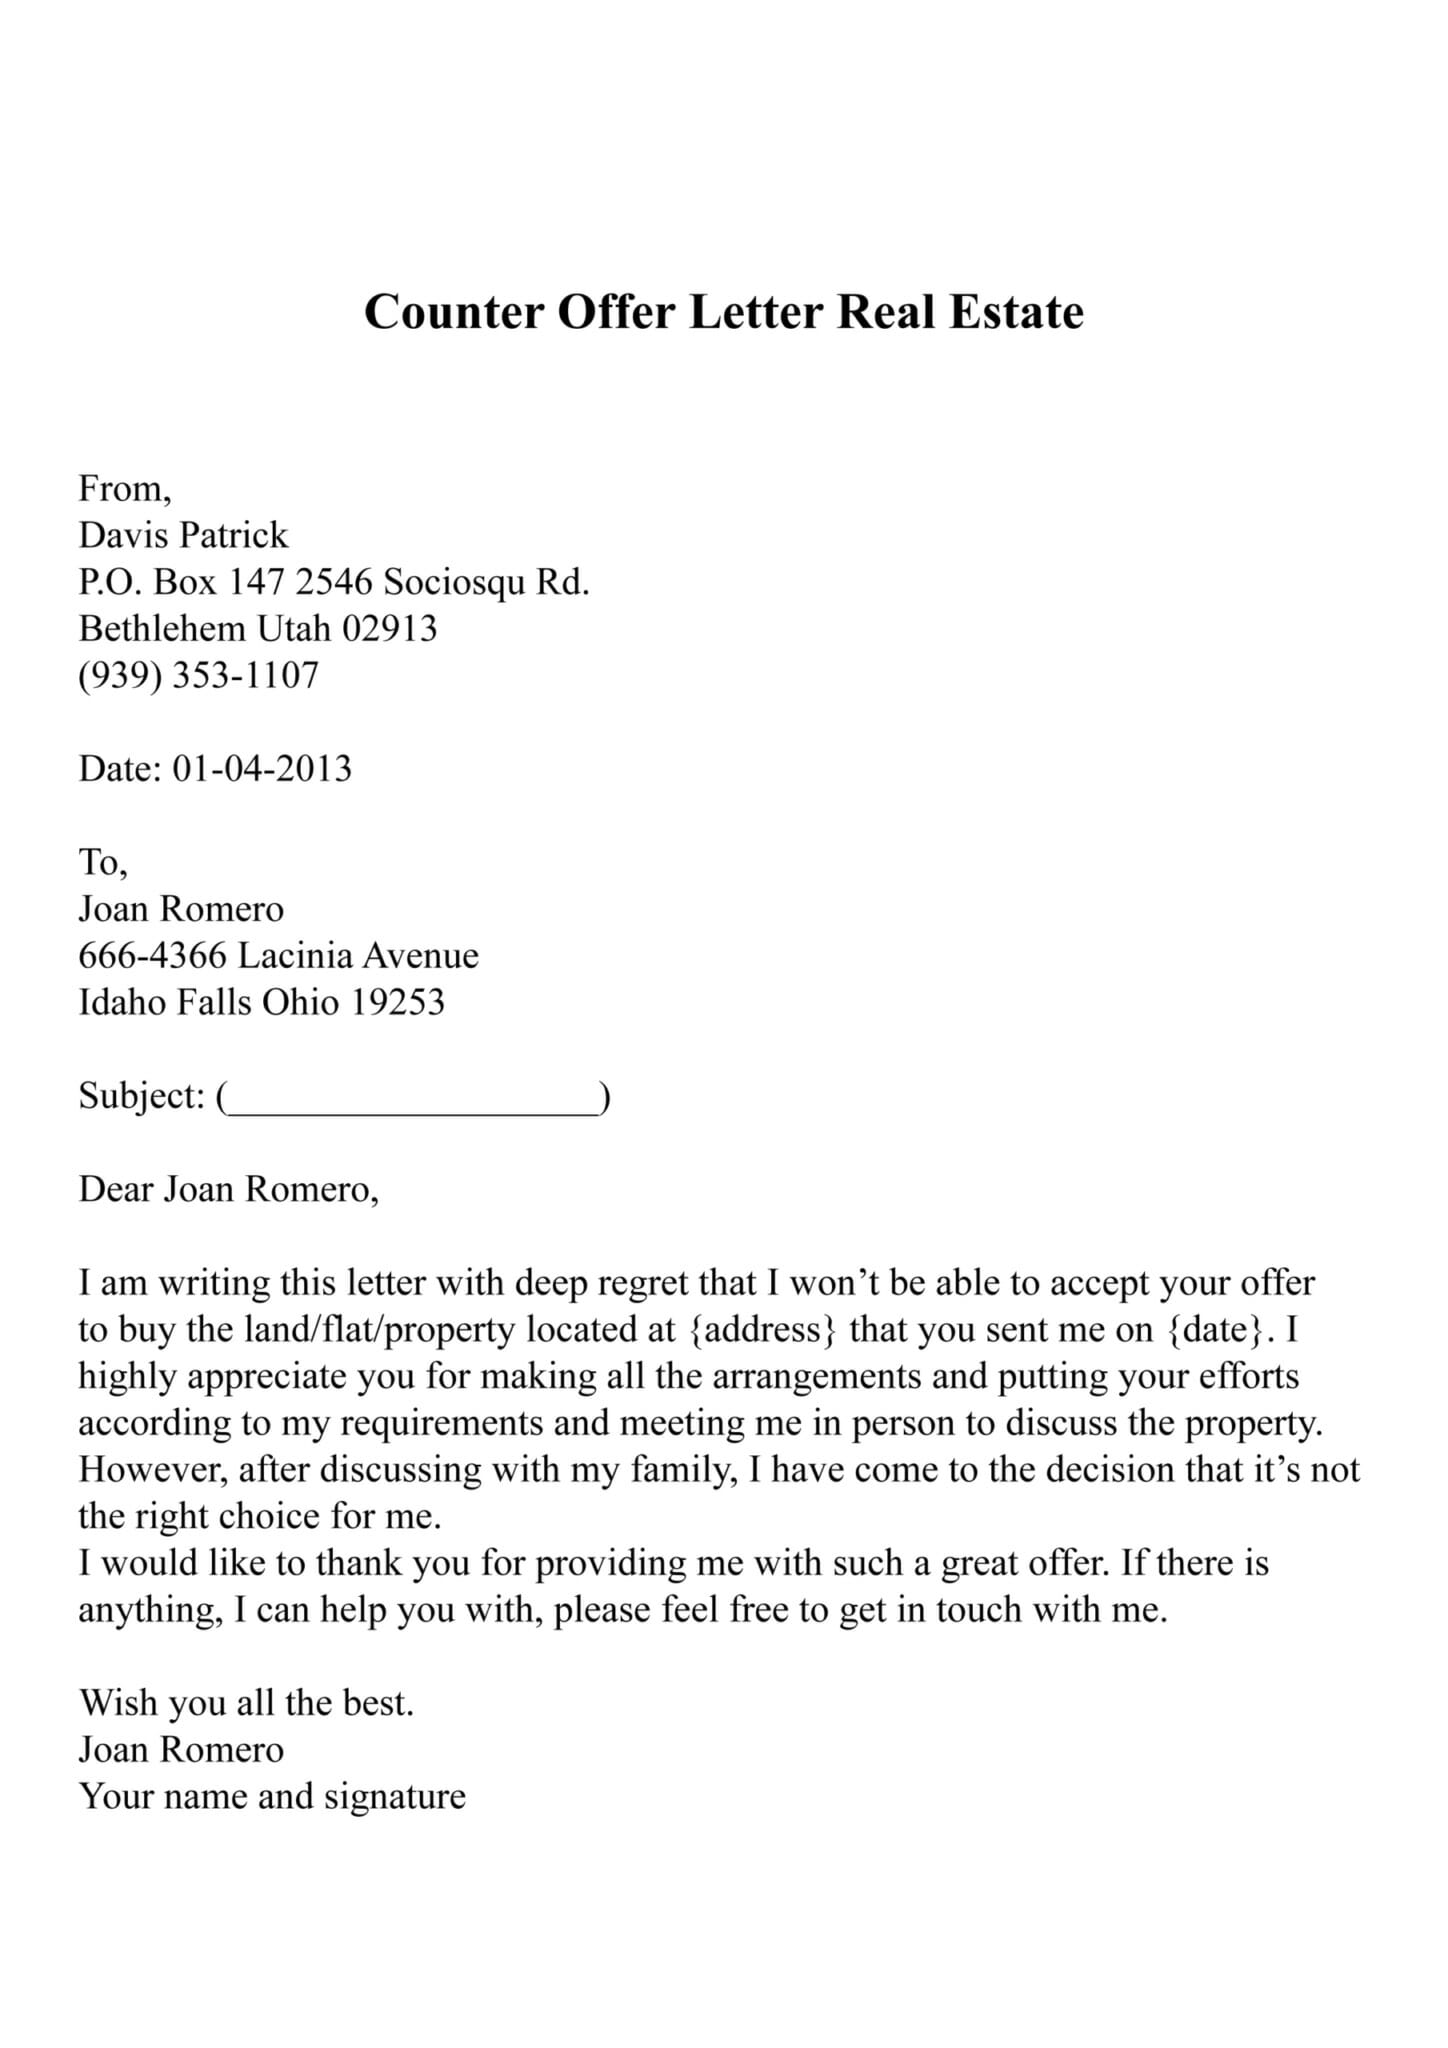 Counter Offer Letter Real Estate